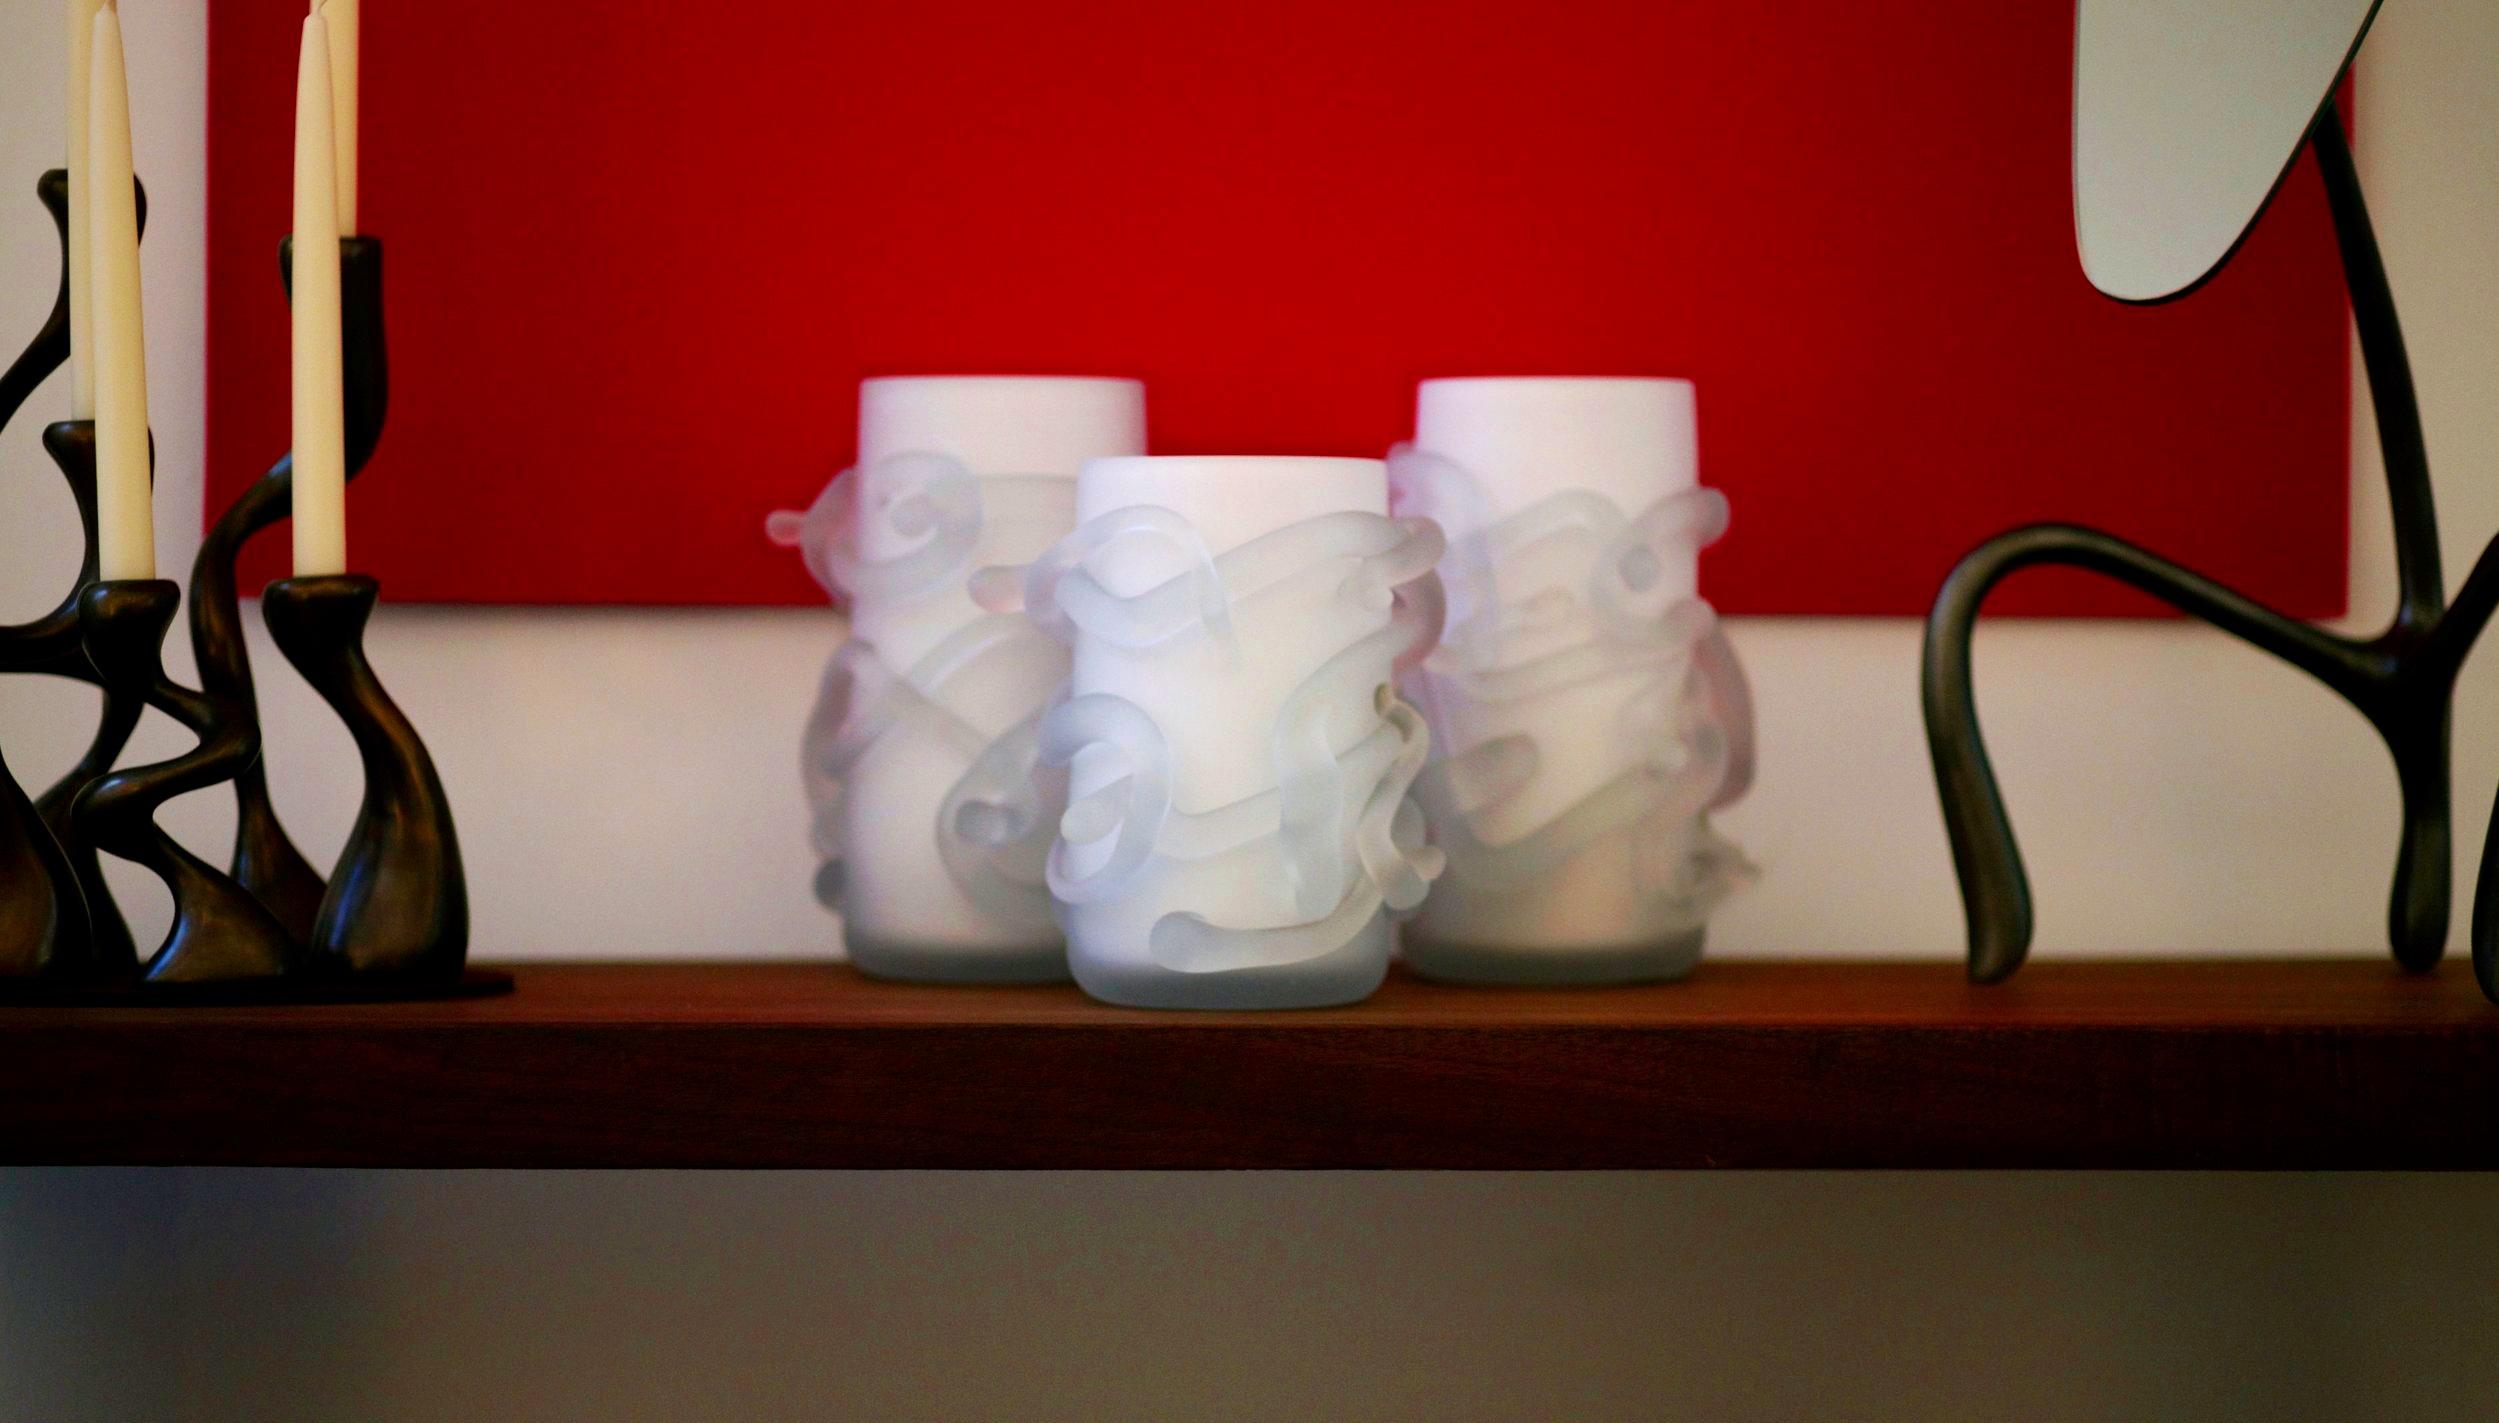 rasta+vases+between+a+Goose-guss+mirror+and+Anna+Mae+candlesticks.jpg